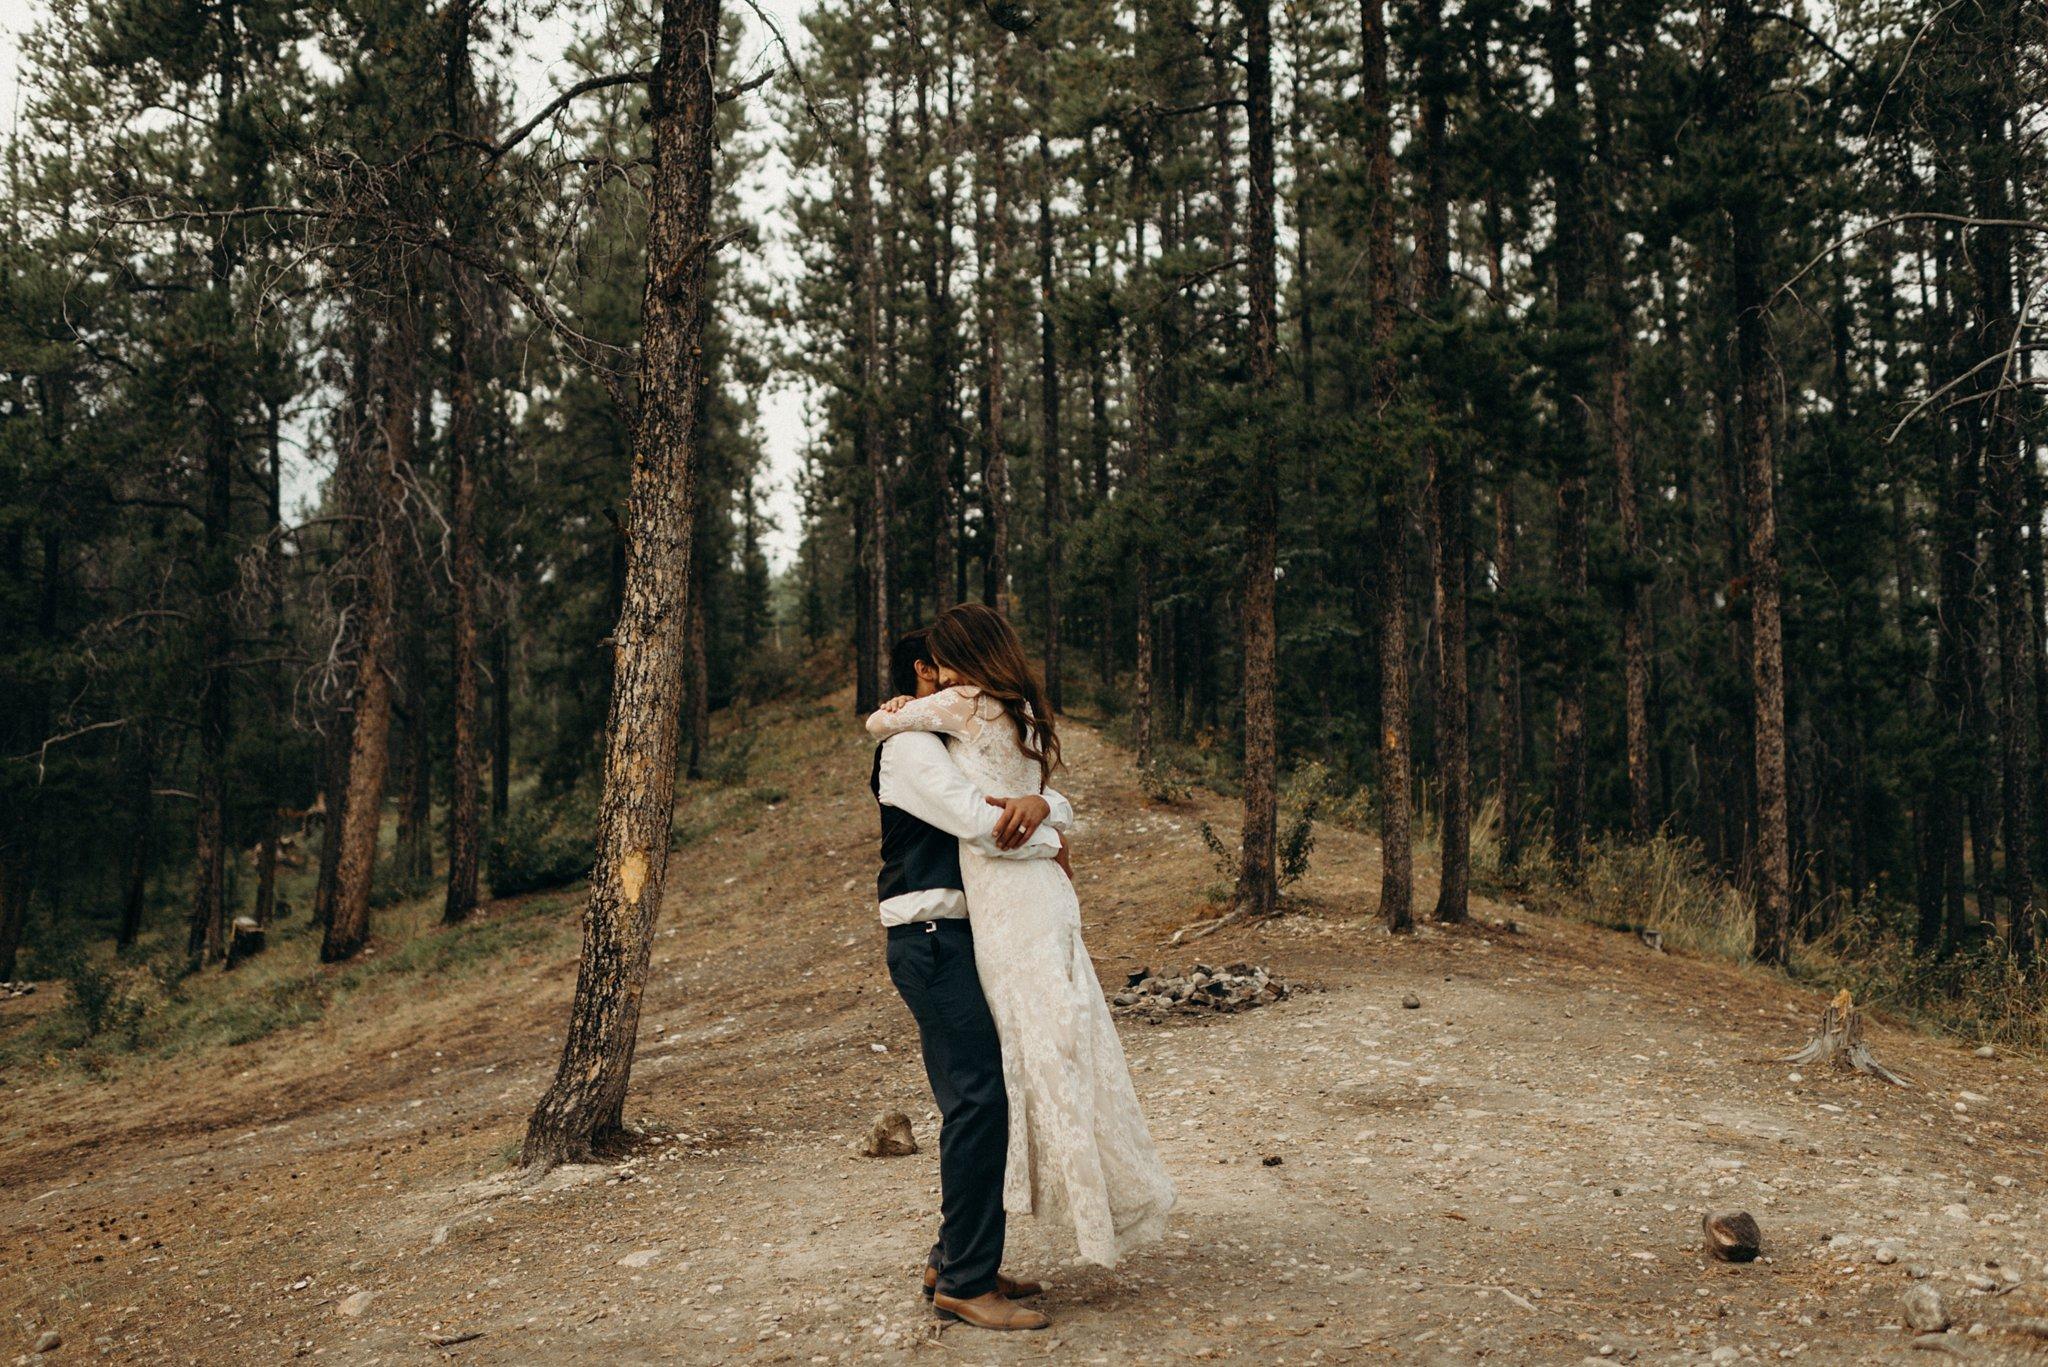 kaihla_tonai_intimate_wedding_elopement_photographer_6743.jpg